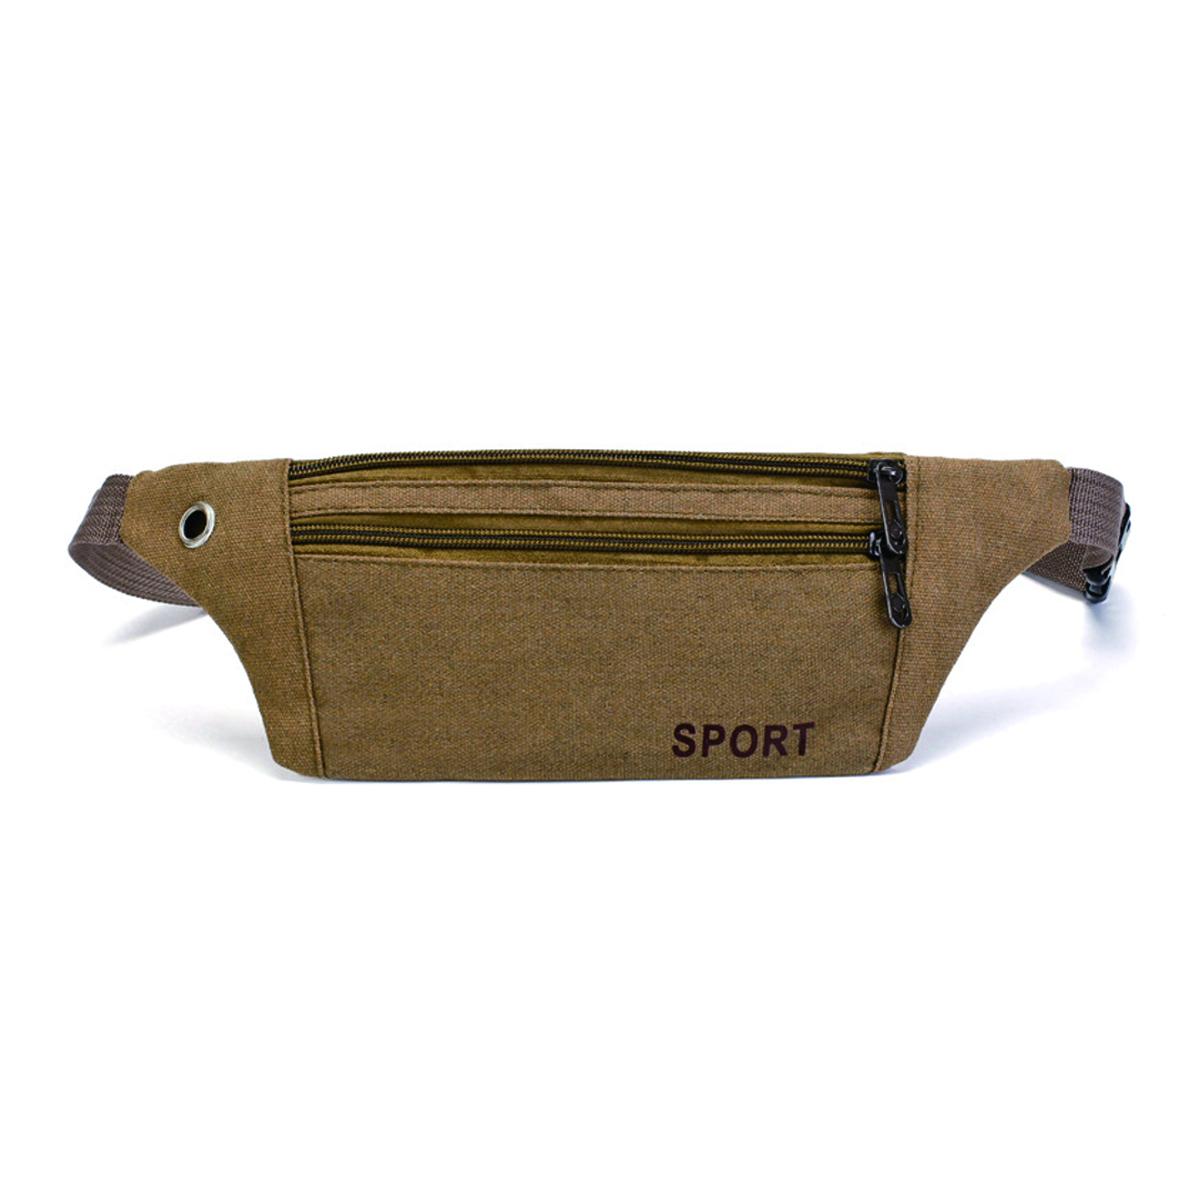 Unisex Canvas Waist Bag Waist Belt Bag Fanny Pack Hip Pouch Travel Sports Phone Pocket